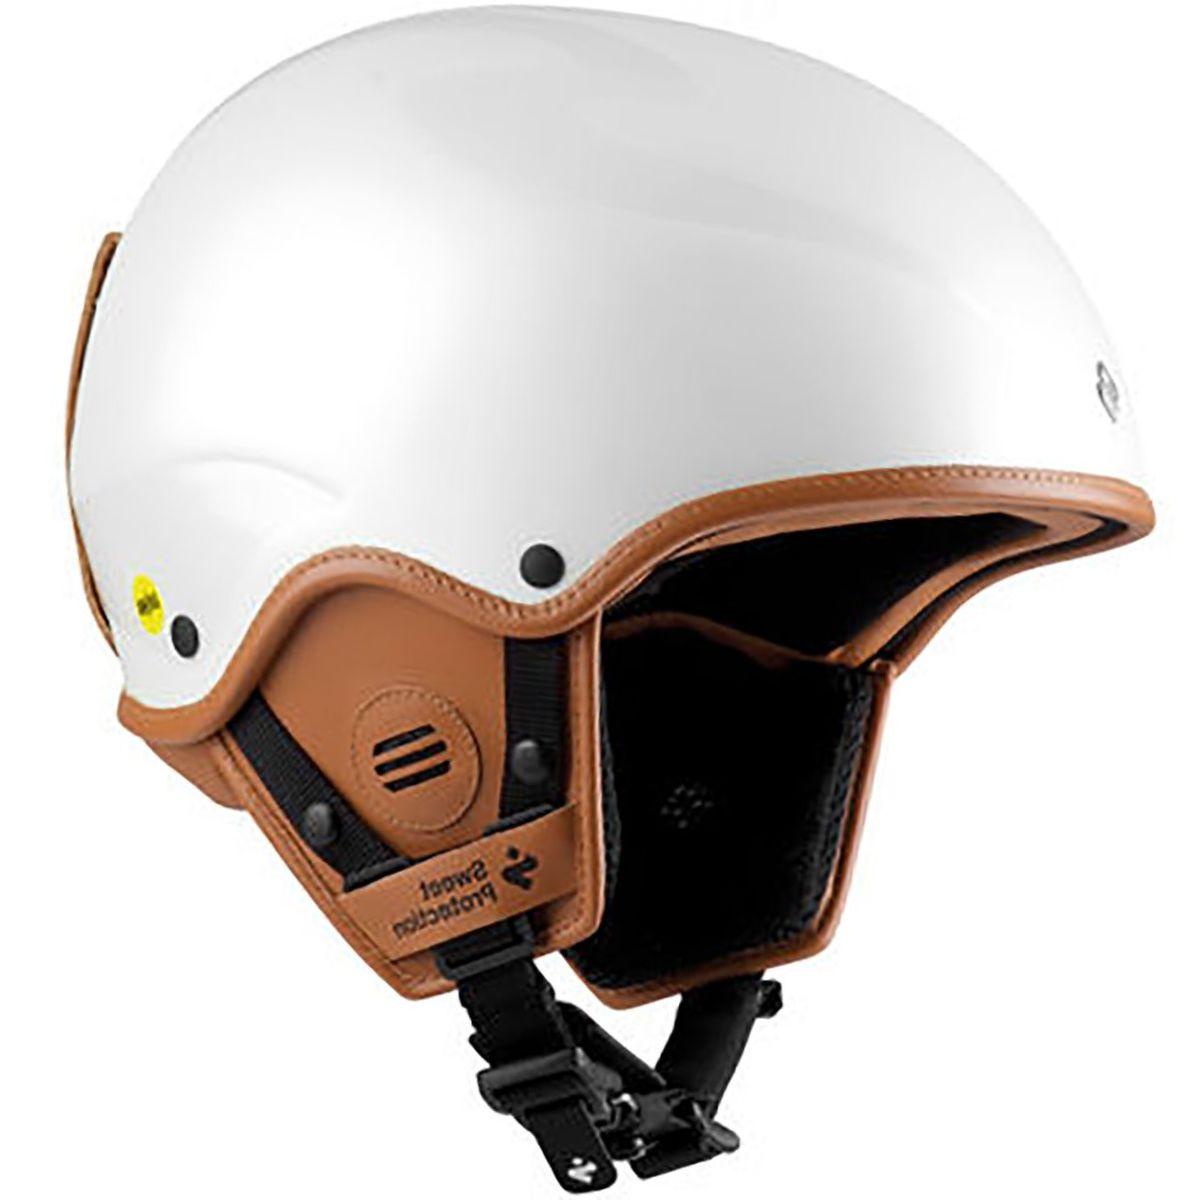 Sweet Protection Rooster II MIPS LE Helmet - Women's